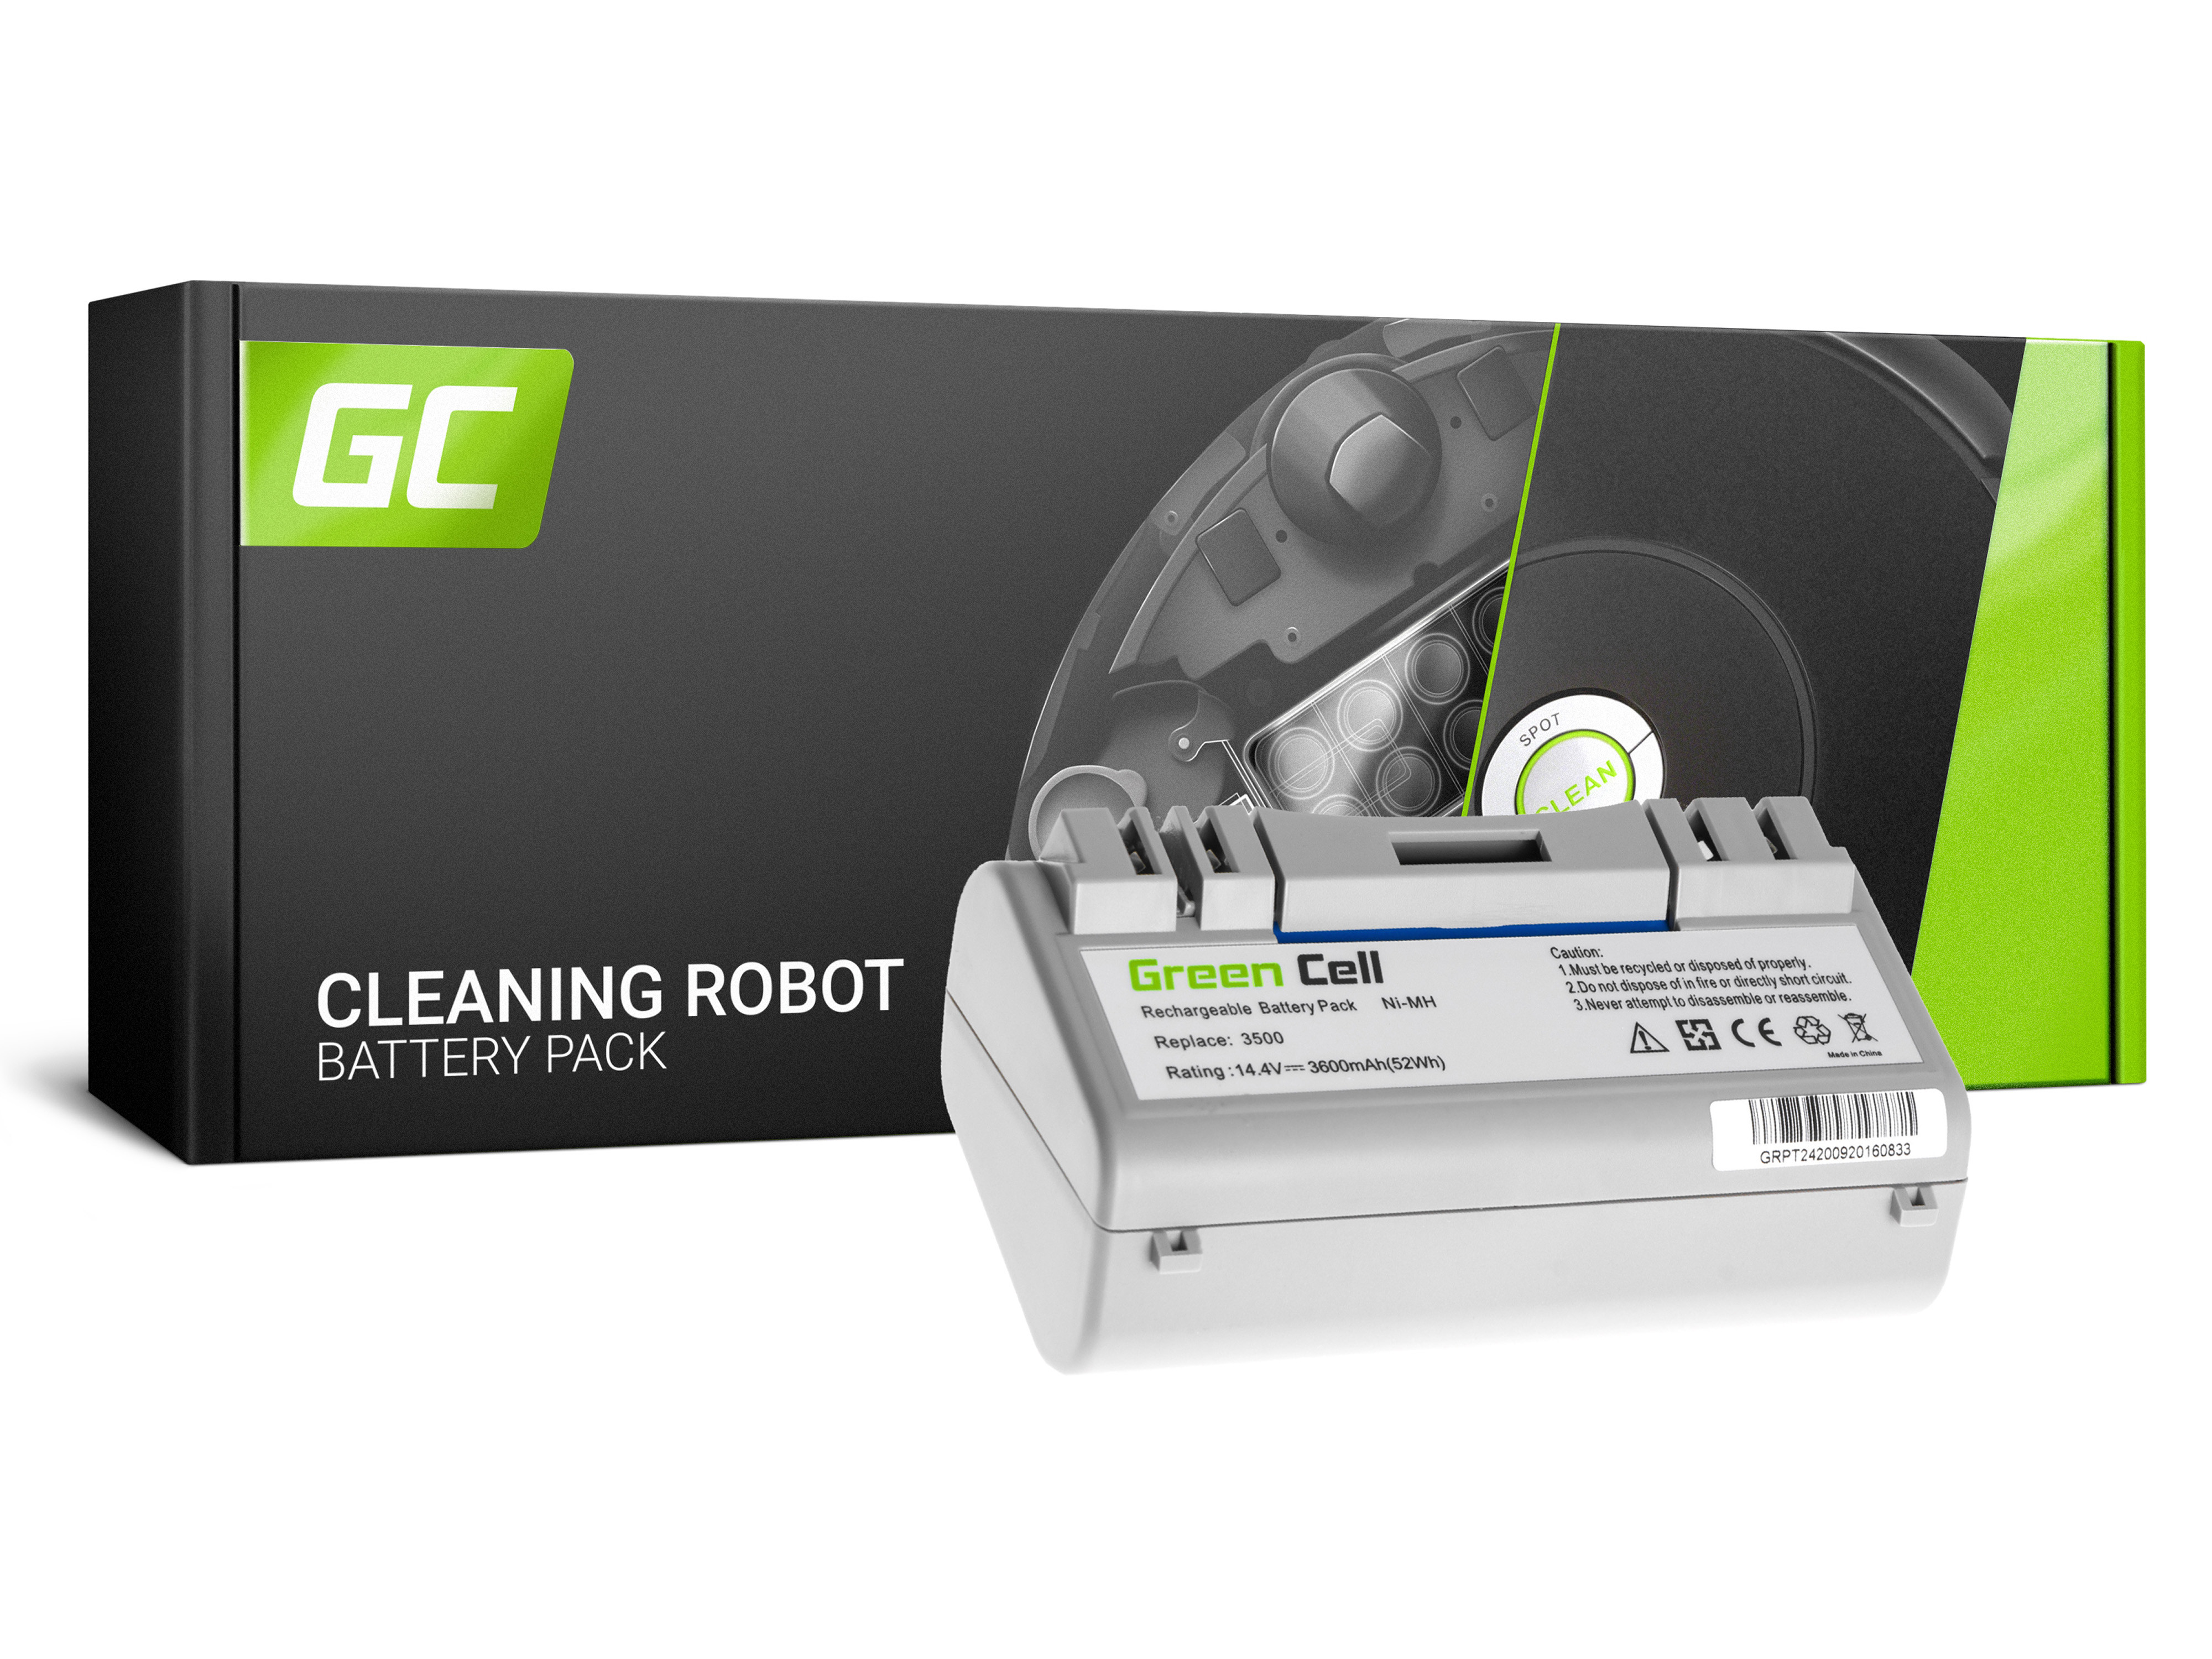 Baterie Green Cell iRobot Scooba 5900 300 350 390 14.4V 3500mAh Ni-MH – neoriginální